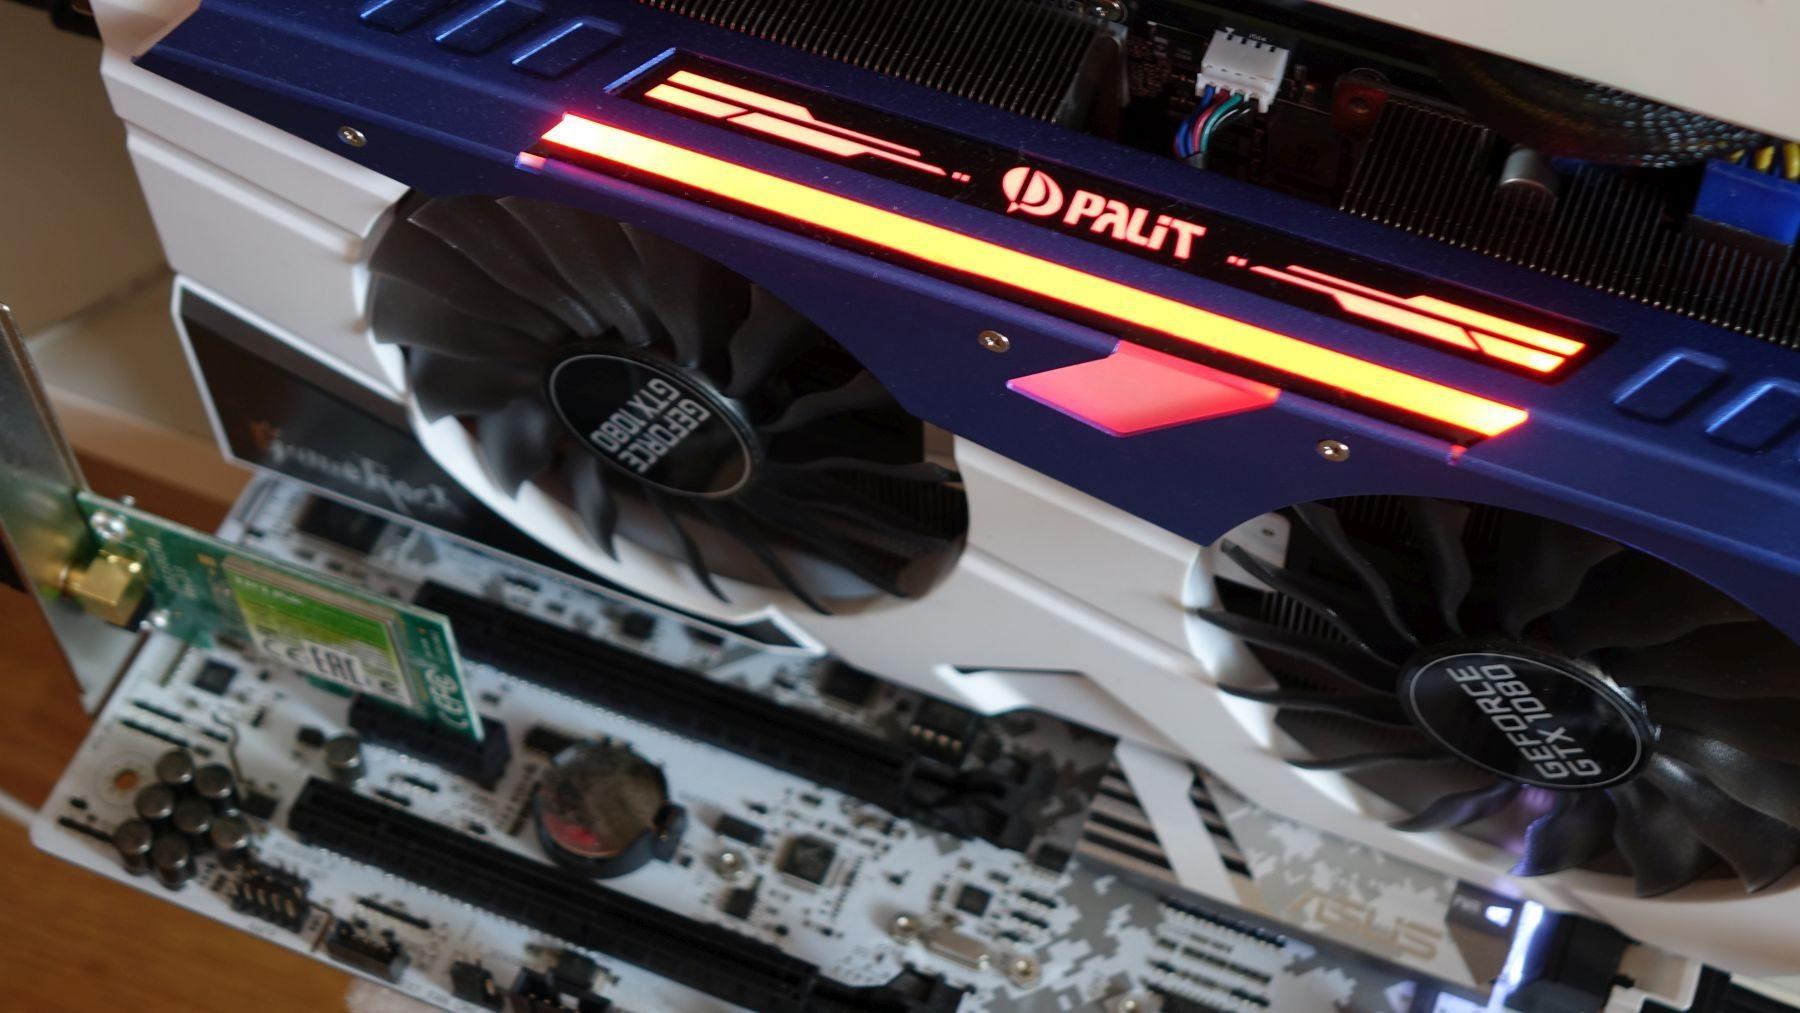 Palit GeForce GTX 1080 GameRock red rgb